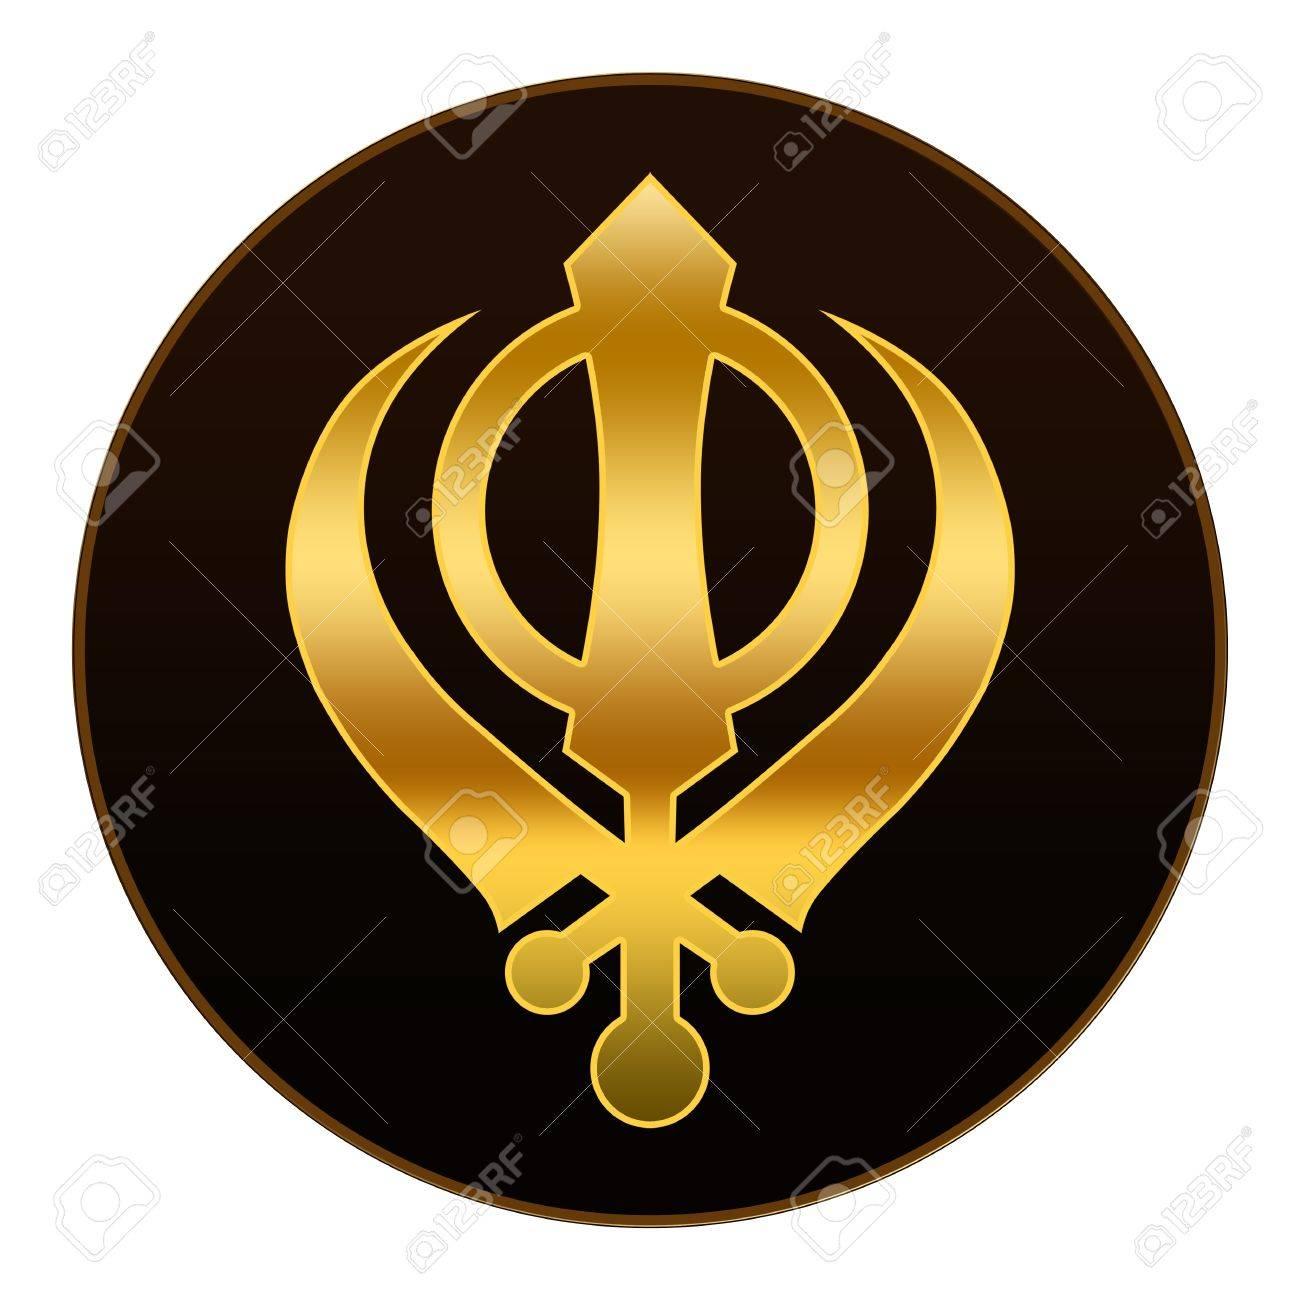 Sikh symbol golden symbol in dark background stock photo sikh symbol golden symbol in dark background stock photo 18175005 biocorpaavc